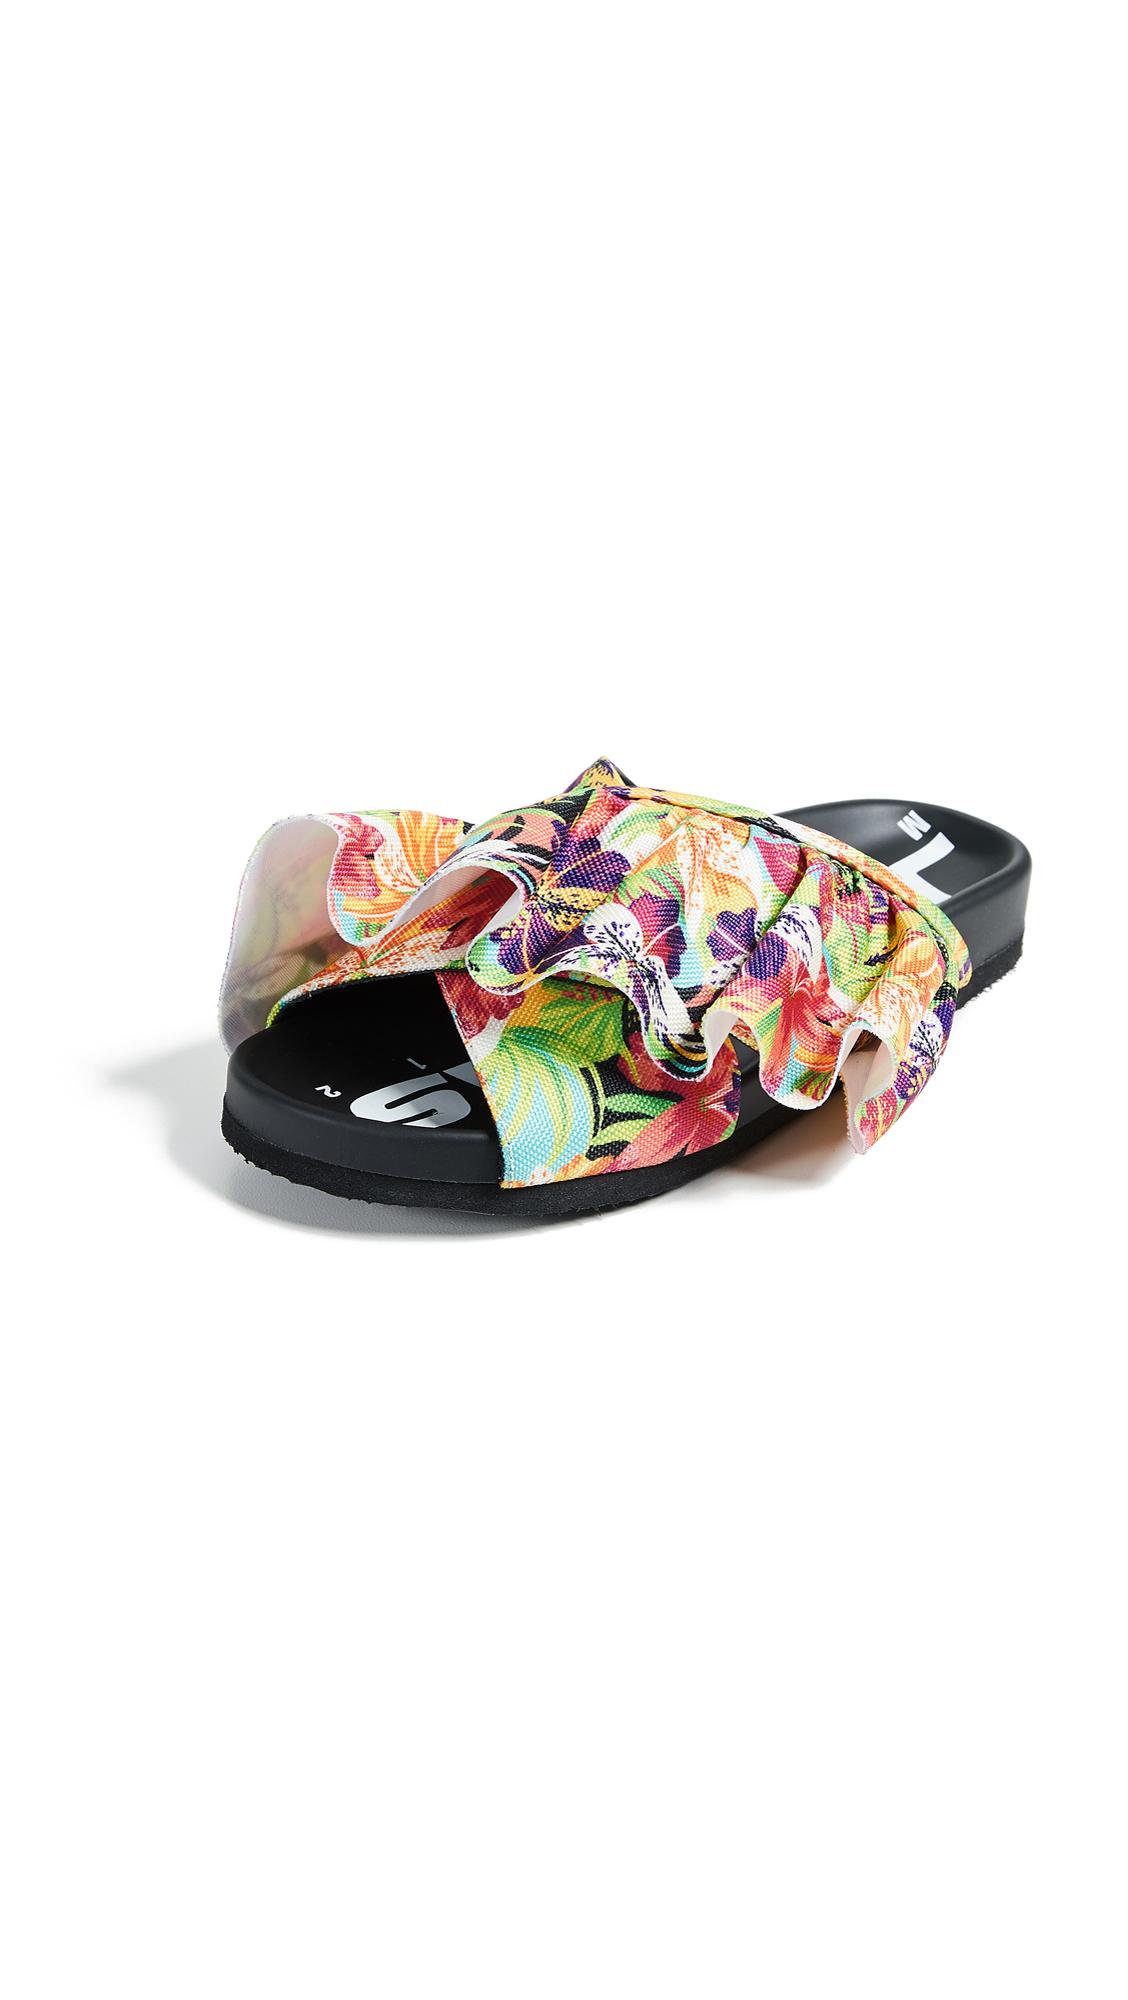 Joshua Sanders Hawaii Slide Sandals - Multicolor Hawaii